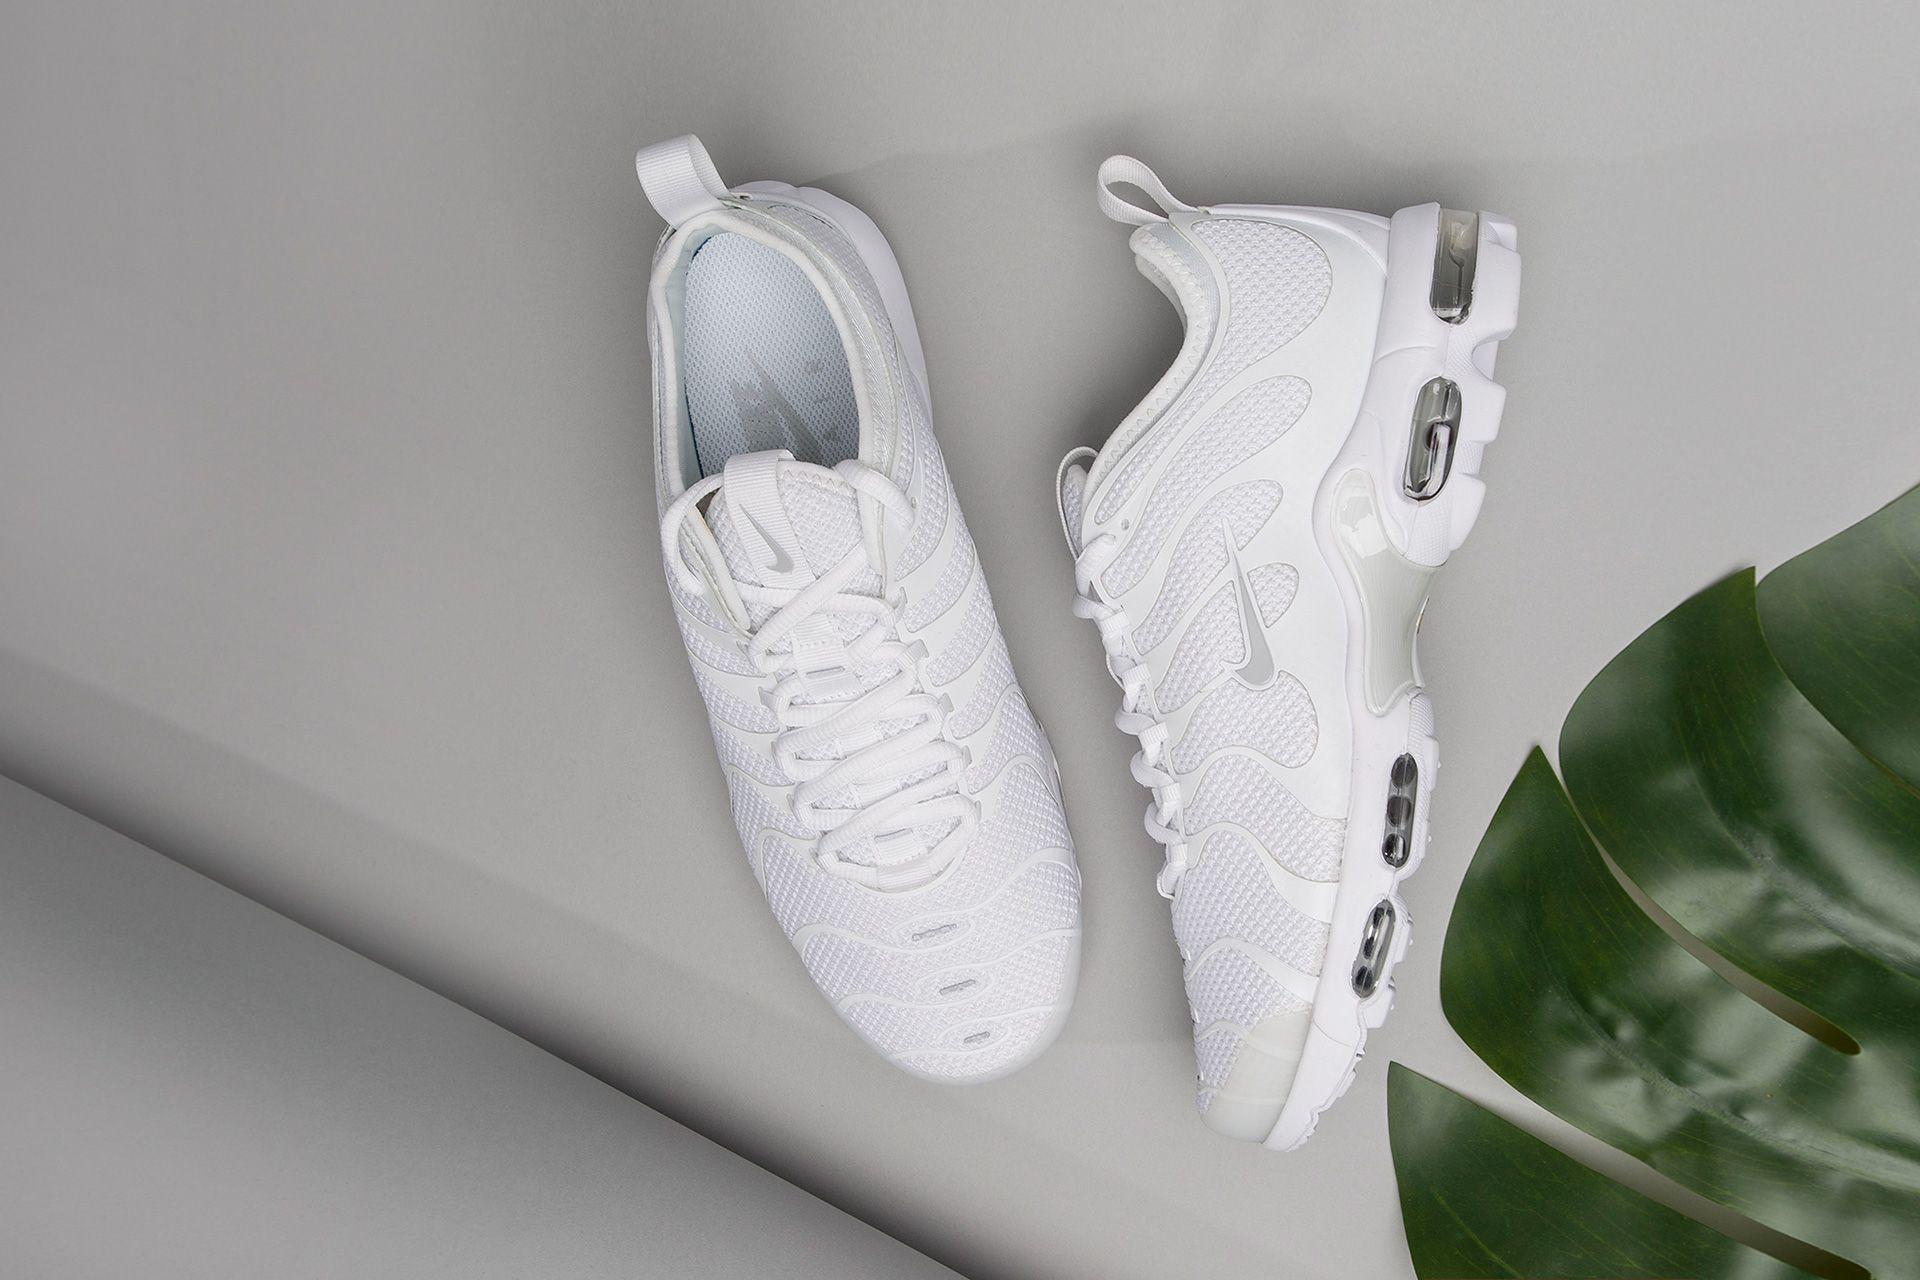 6b683ccd Купить белые мужские кроссовки Air Max Plus TN Ultra от Nike (898015 ...